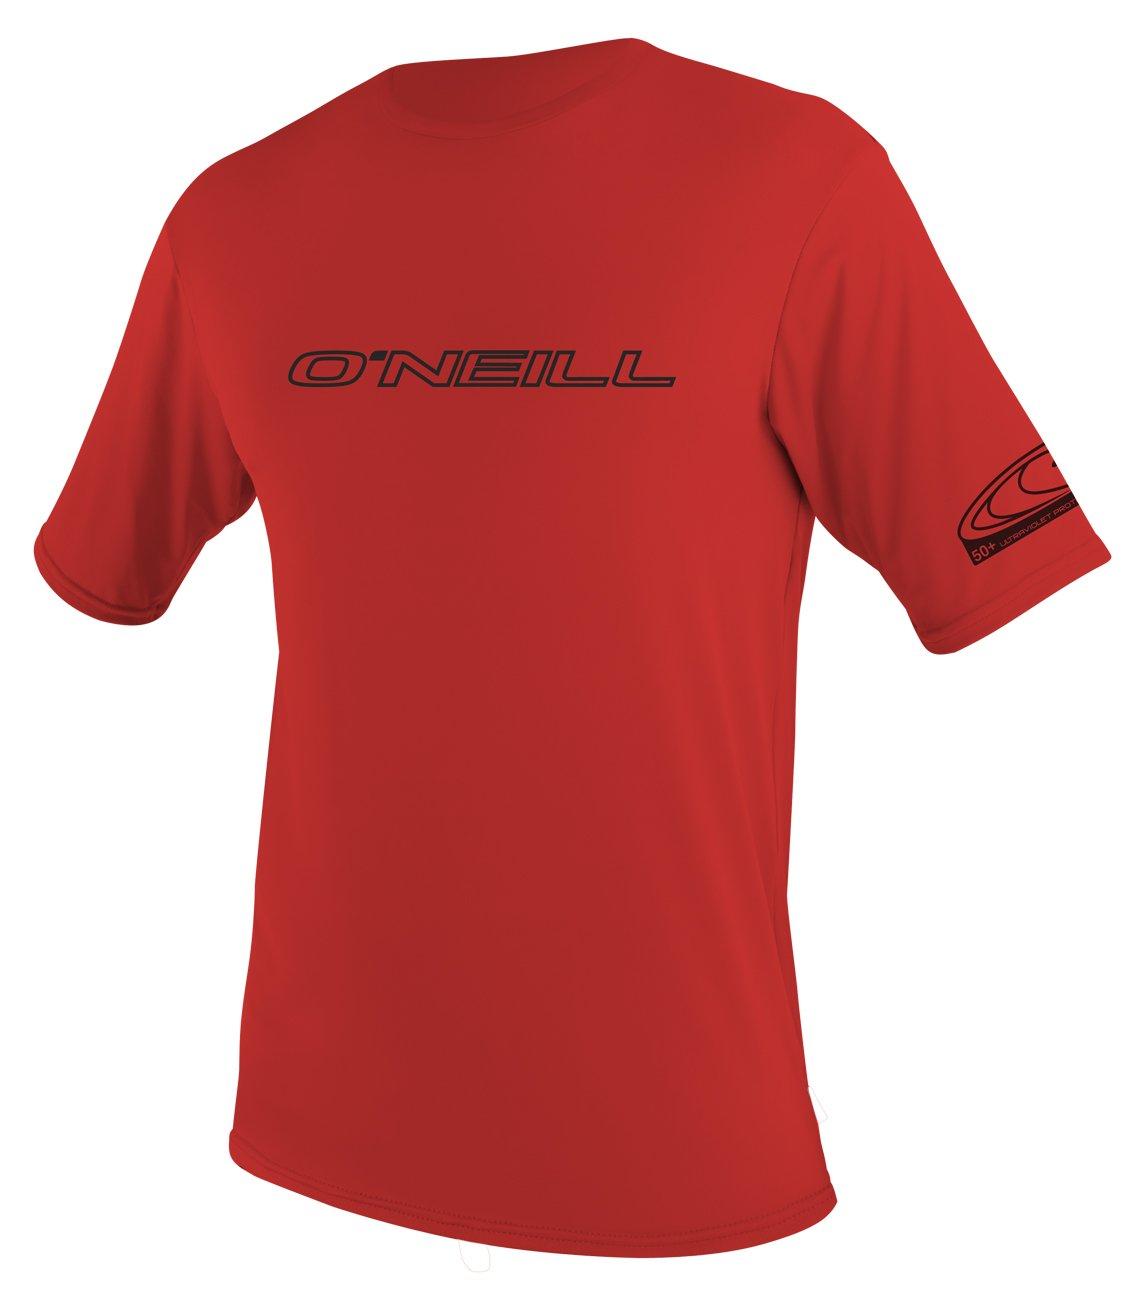 O'Neill Wetsuits Men's Basic Skins UPF 50+ Short Sleeve Sun Shirt, Red, Small